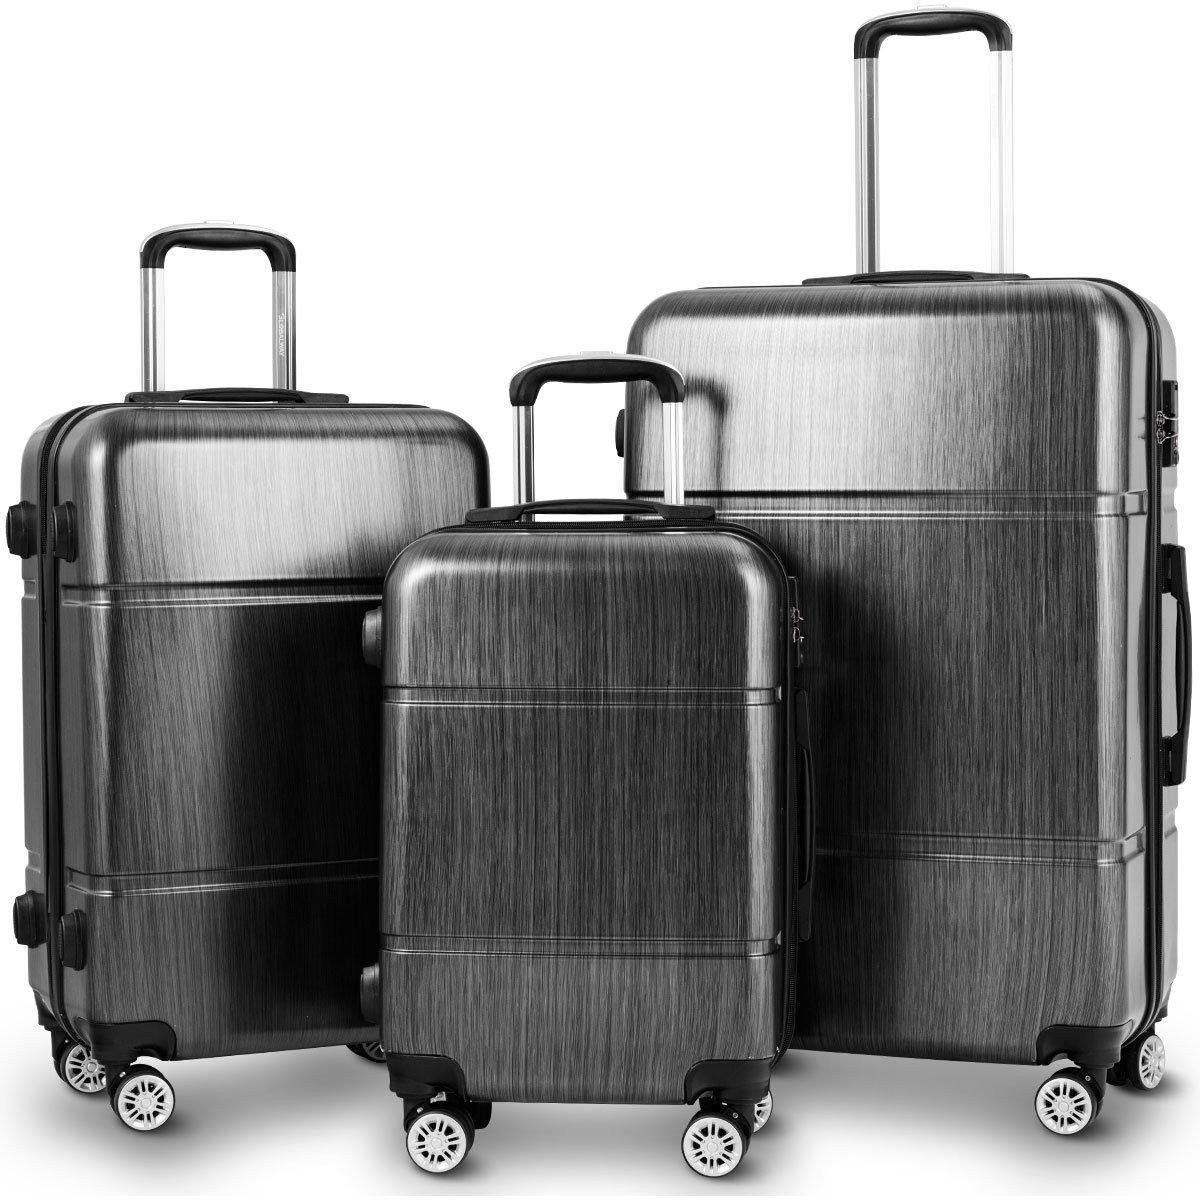 0193374f821d Goplus Luggage 3 Pieces Expandable Luggage Sets (20/24/28), PC+ABS  Lightweight Hardshell Suitcase w/TSA Lock Spinner Set (Black)